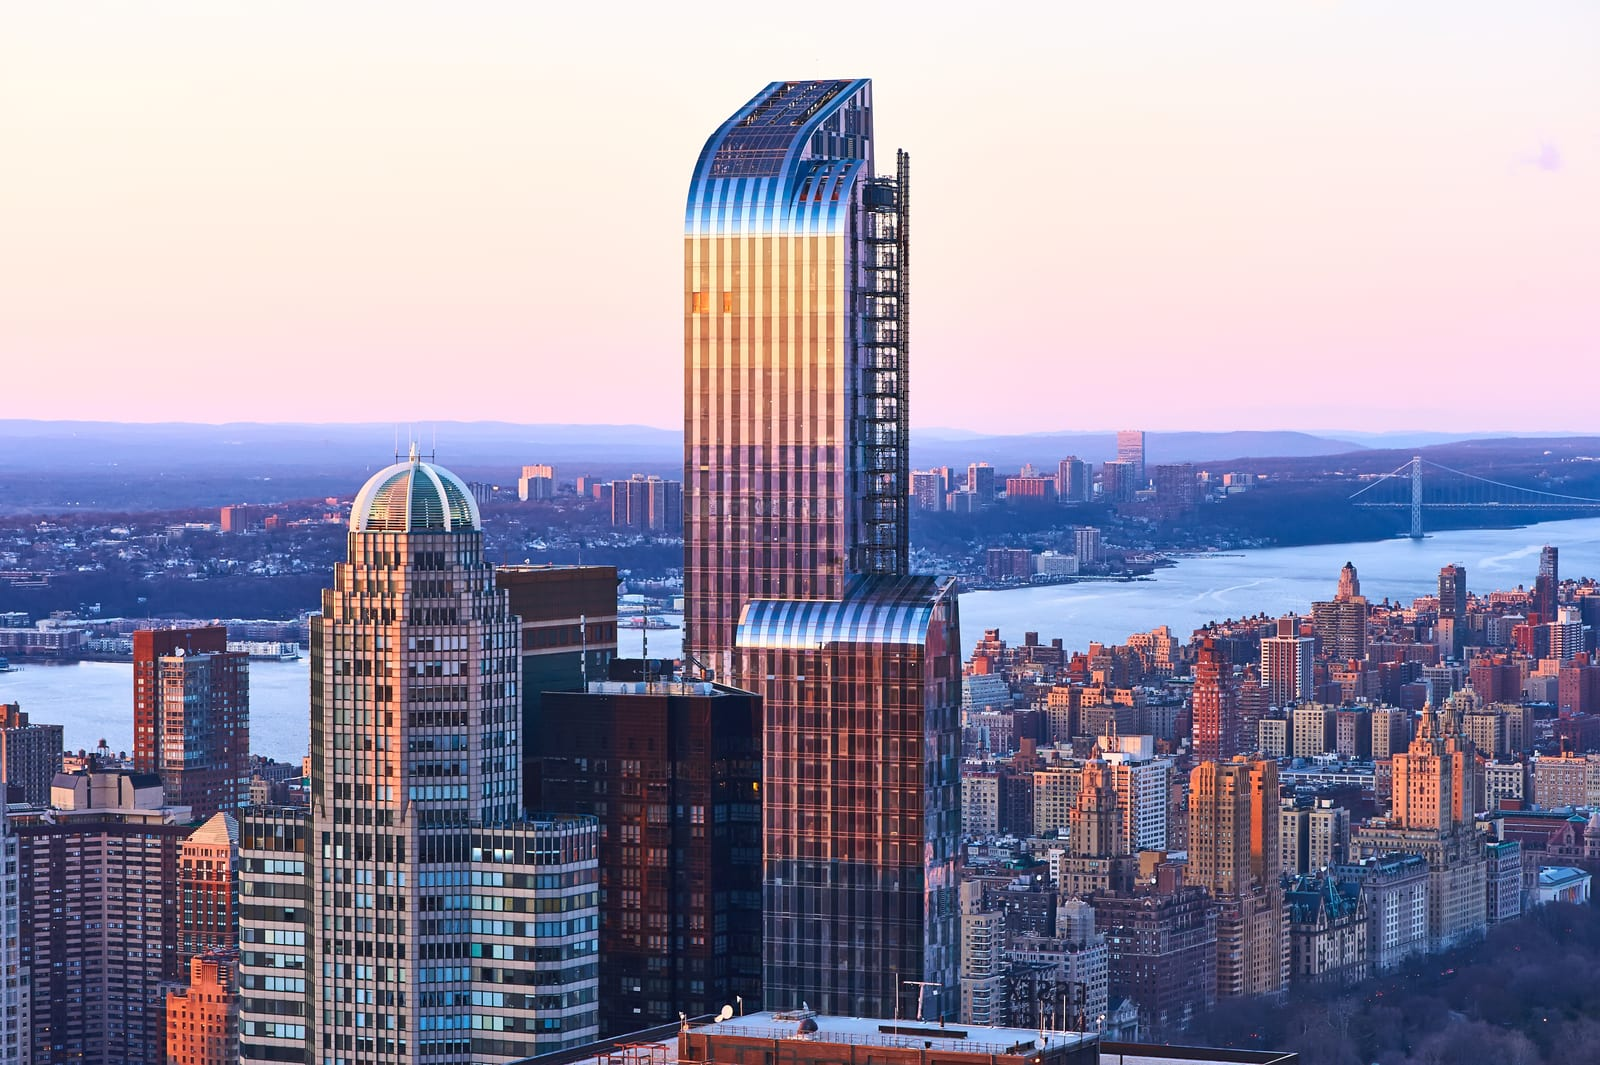 NoHo Manhattan, NY Private Investigator